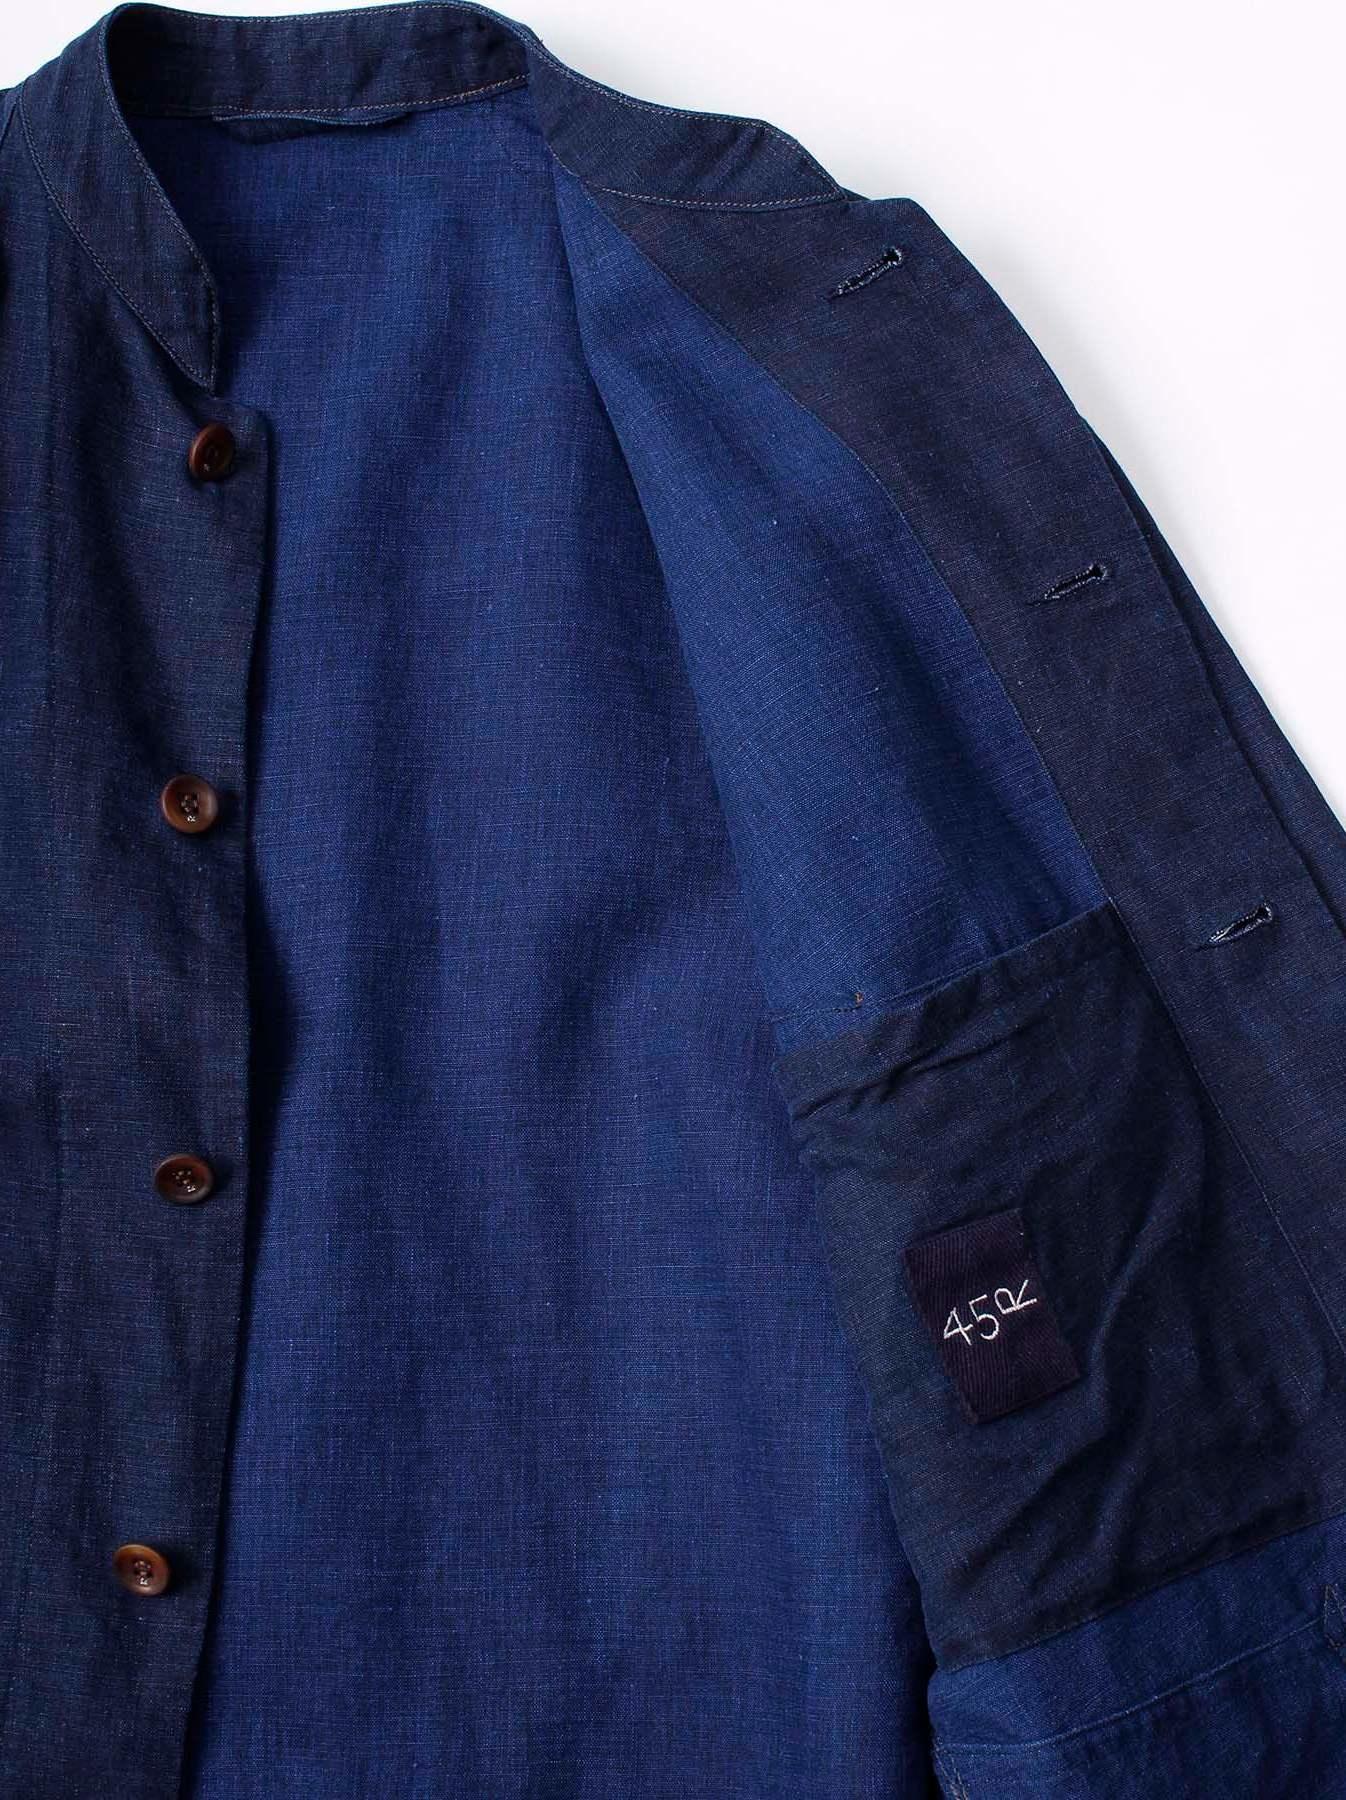 WH Indigo Linen Stand Collar Jacket-7